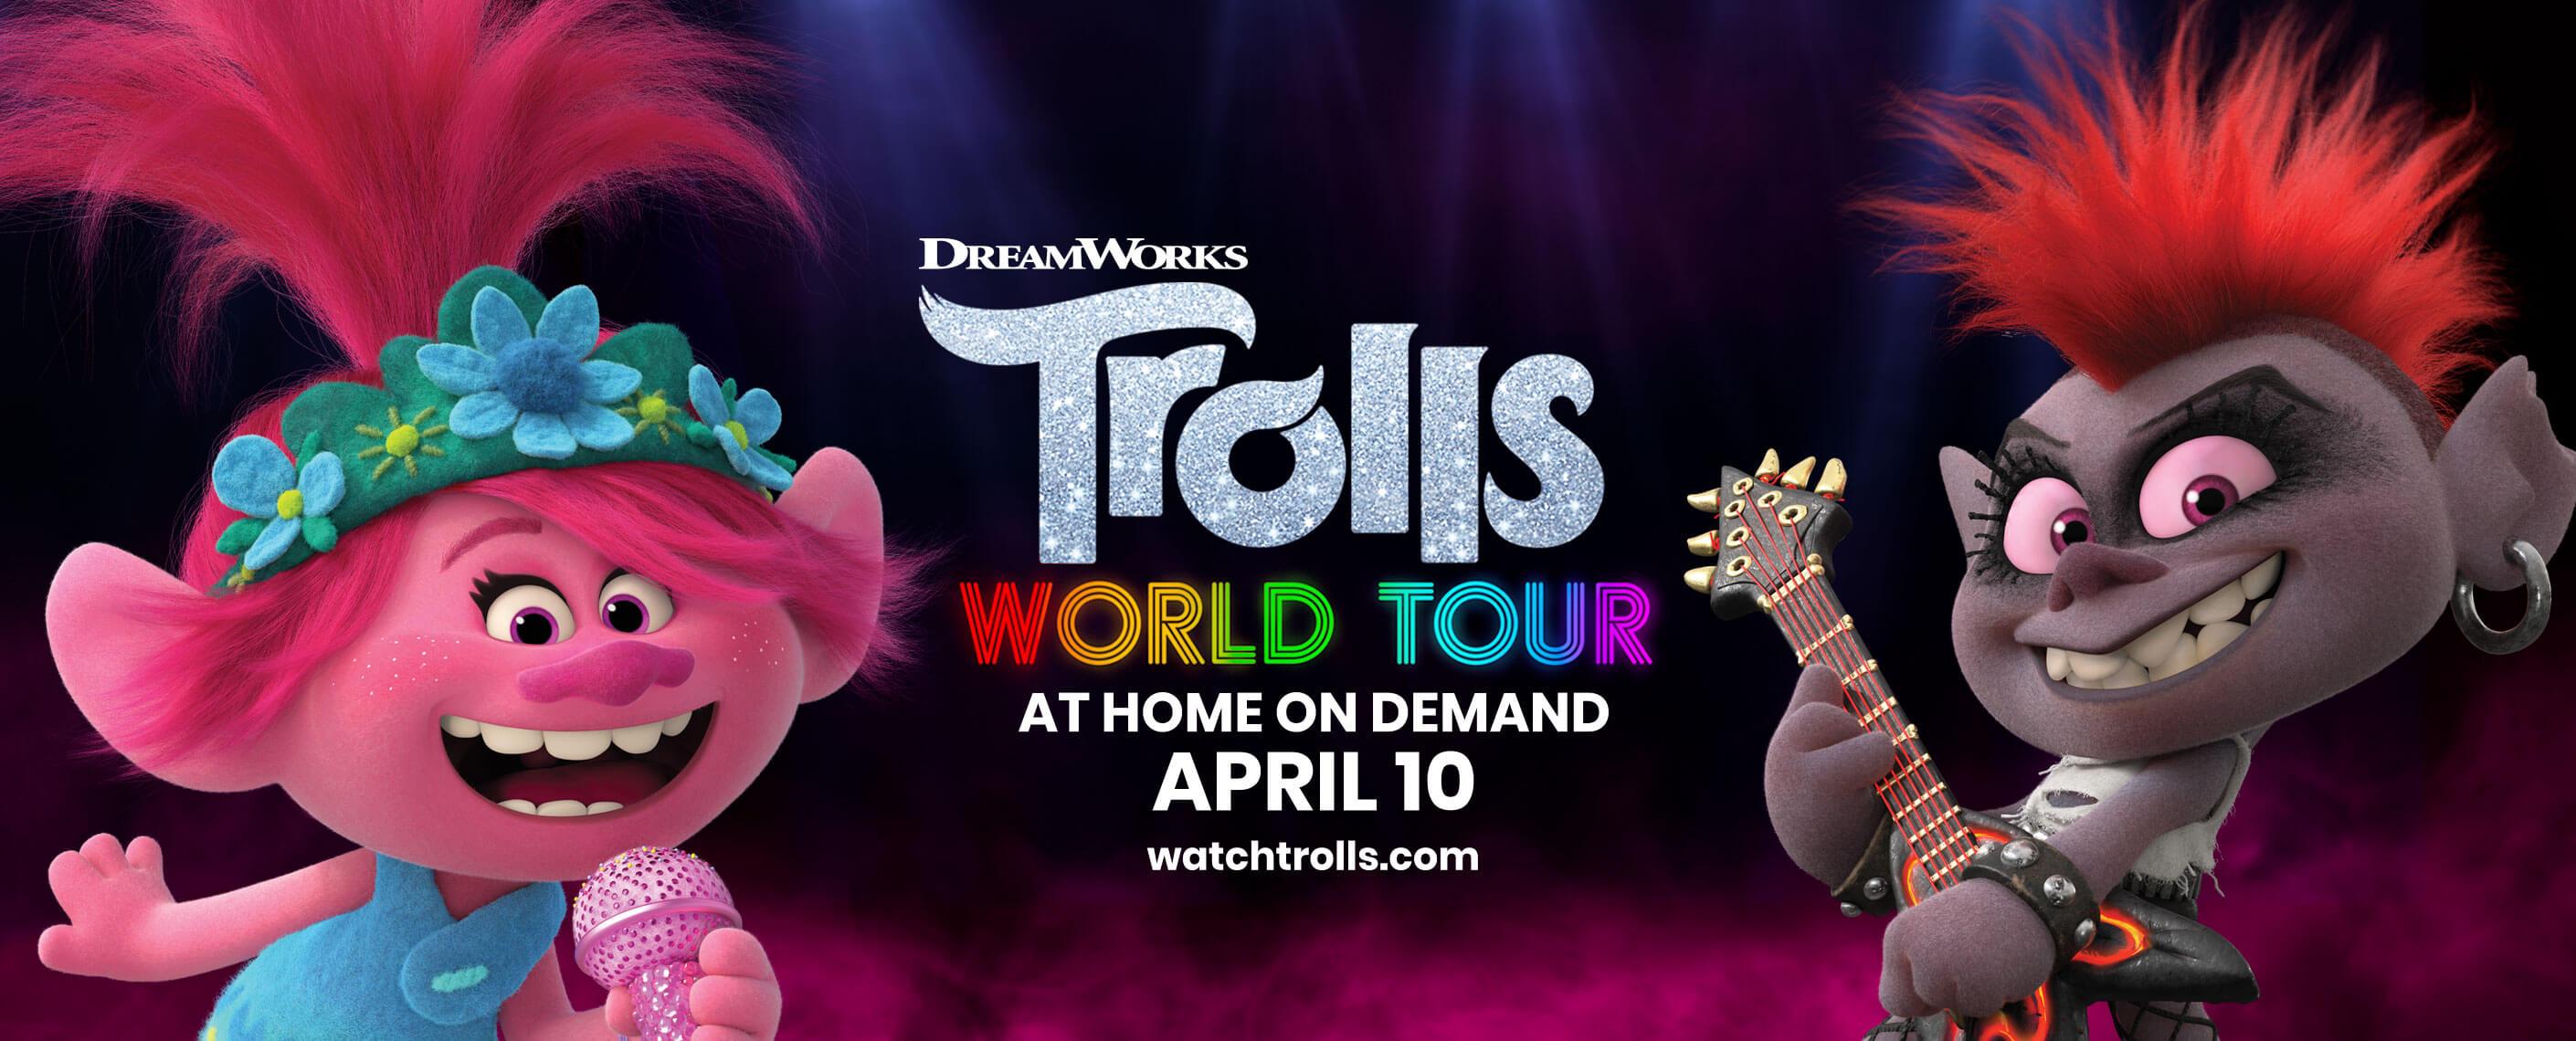 trolls world tour mcdonalds